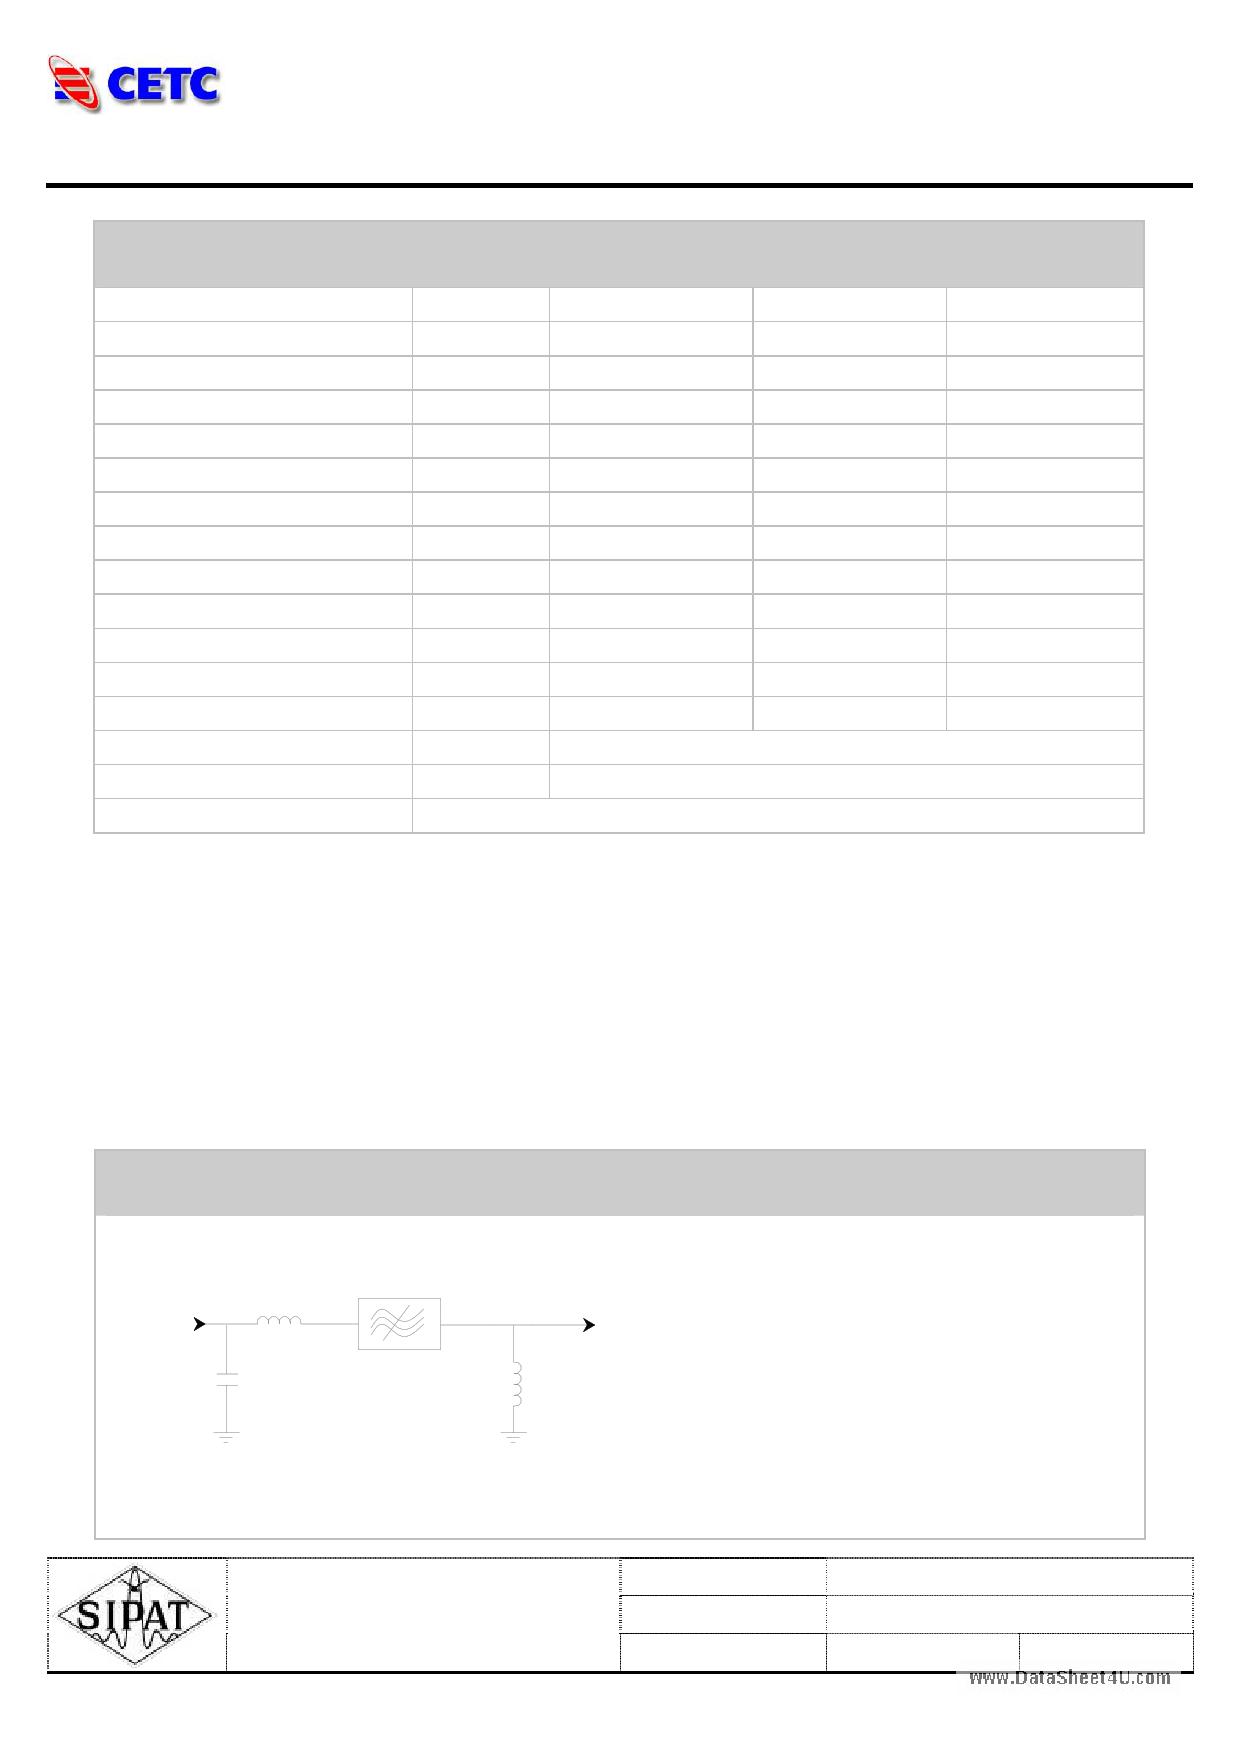 LBT10703 datasheet